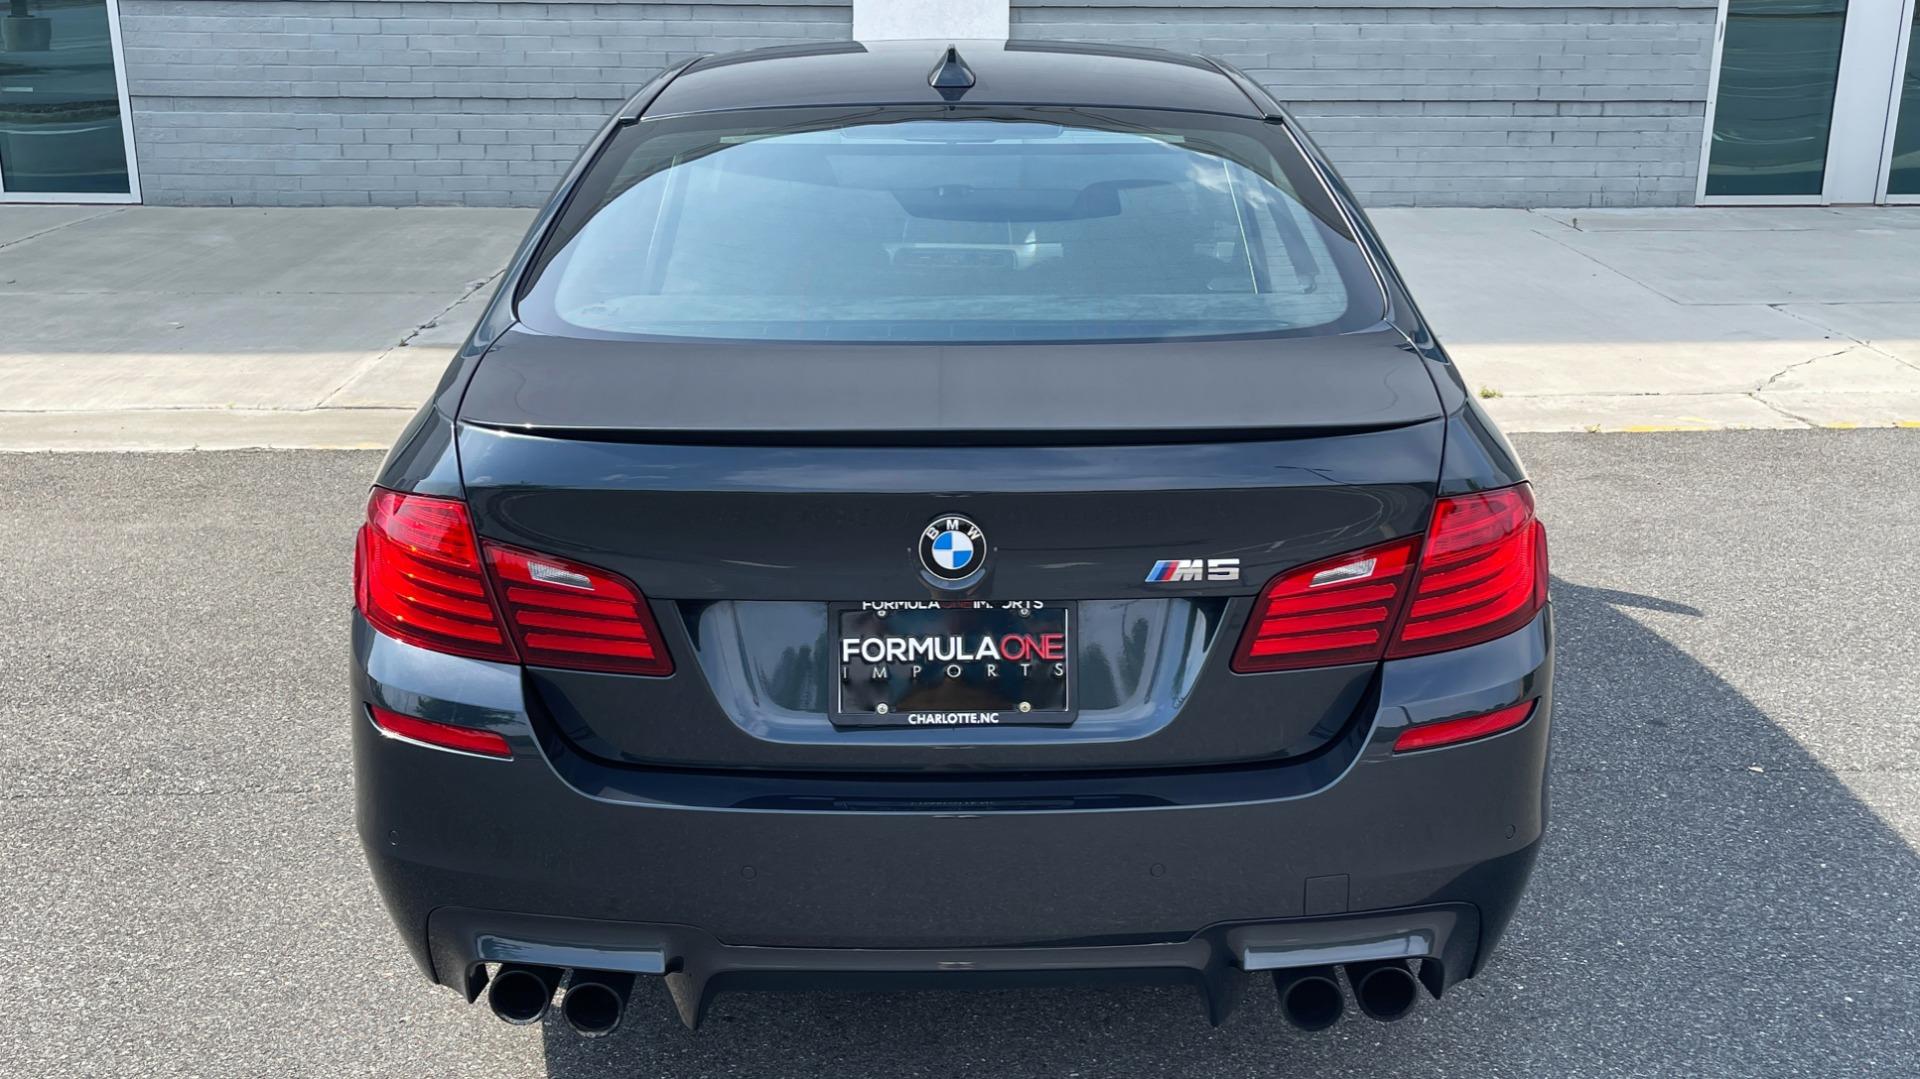 Used 2015 BMW M5 SEDAN / EXEC PKG / HUD / NAV / B&O SND / SUNROOF / REARVIEW for sale Sold at Formula Imports in Charlotte NC 28227 6